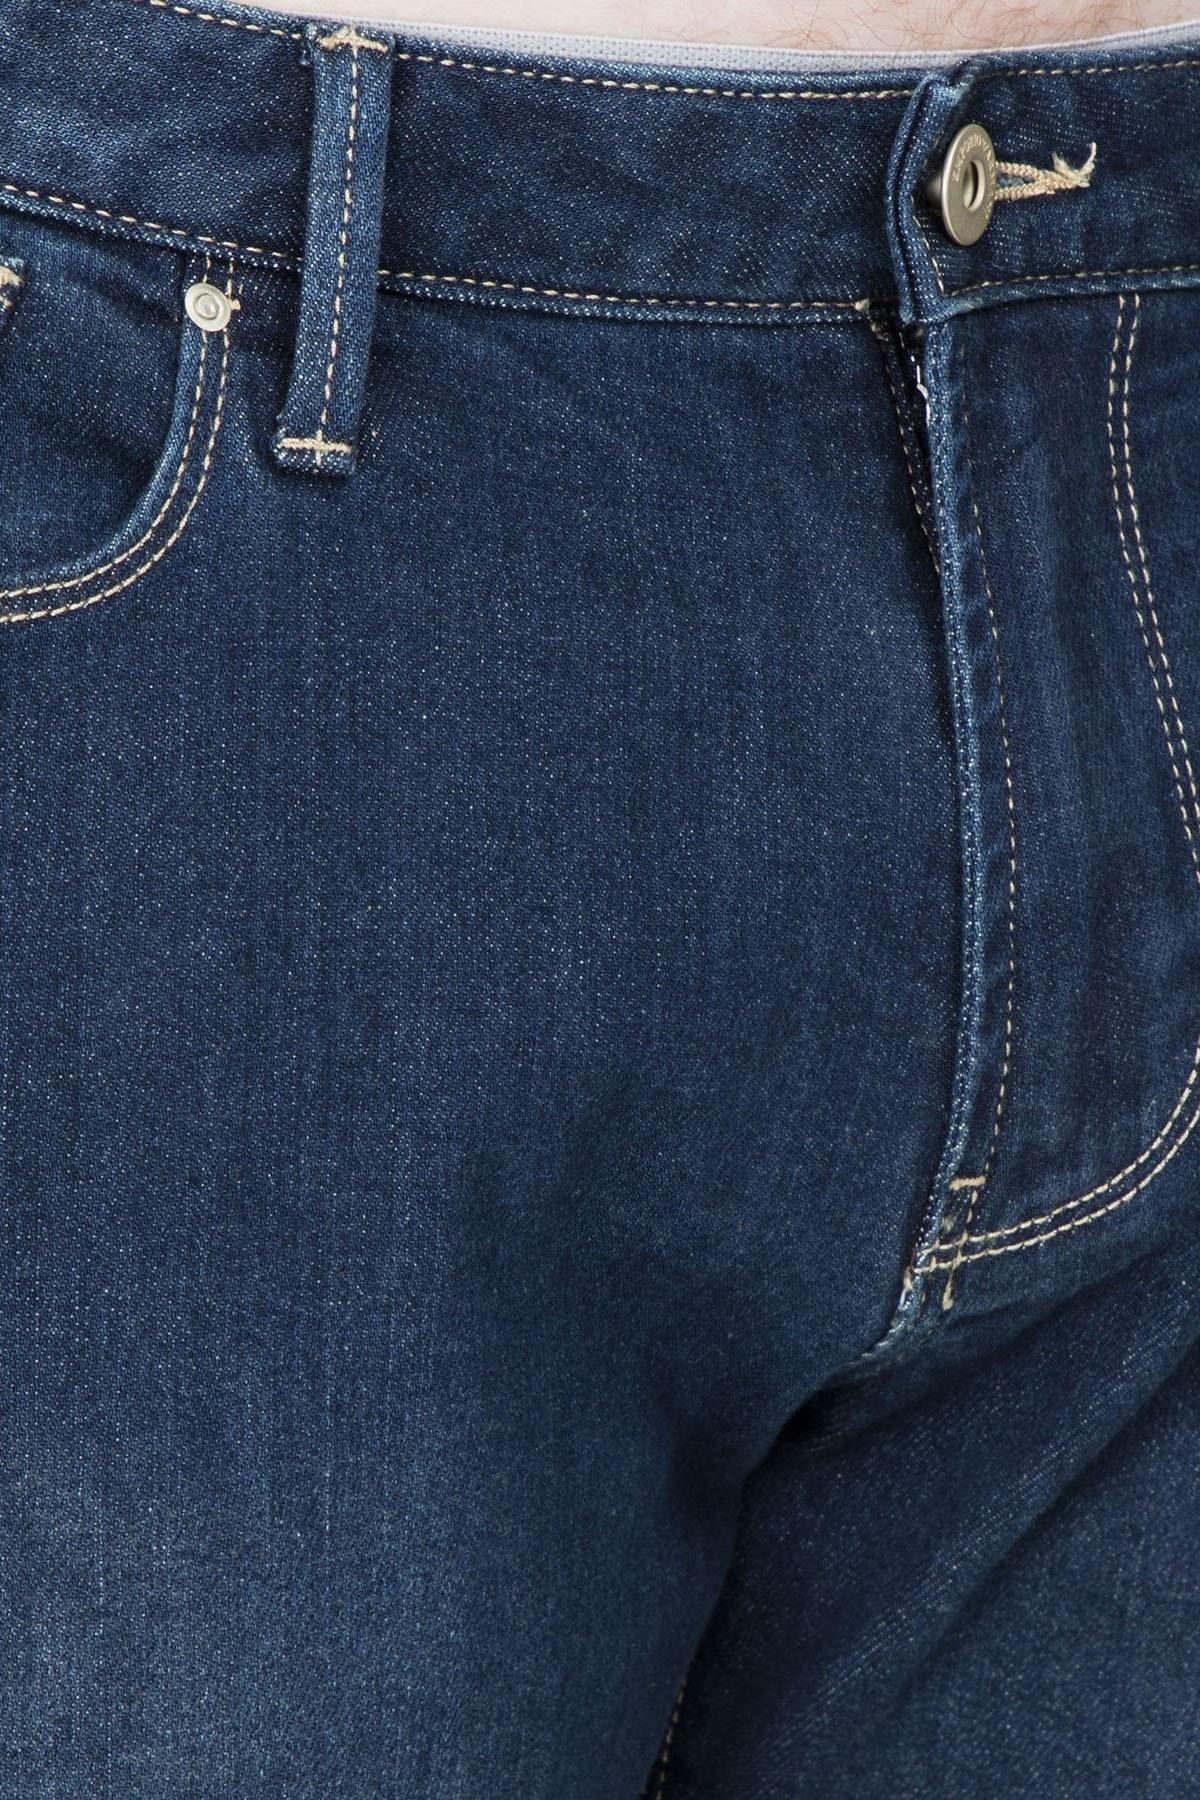 Emporio Armani J06 Jeans Erkek Kot Pantolon S 3G1J06 1DLRZ 941 LACİVERT